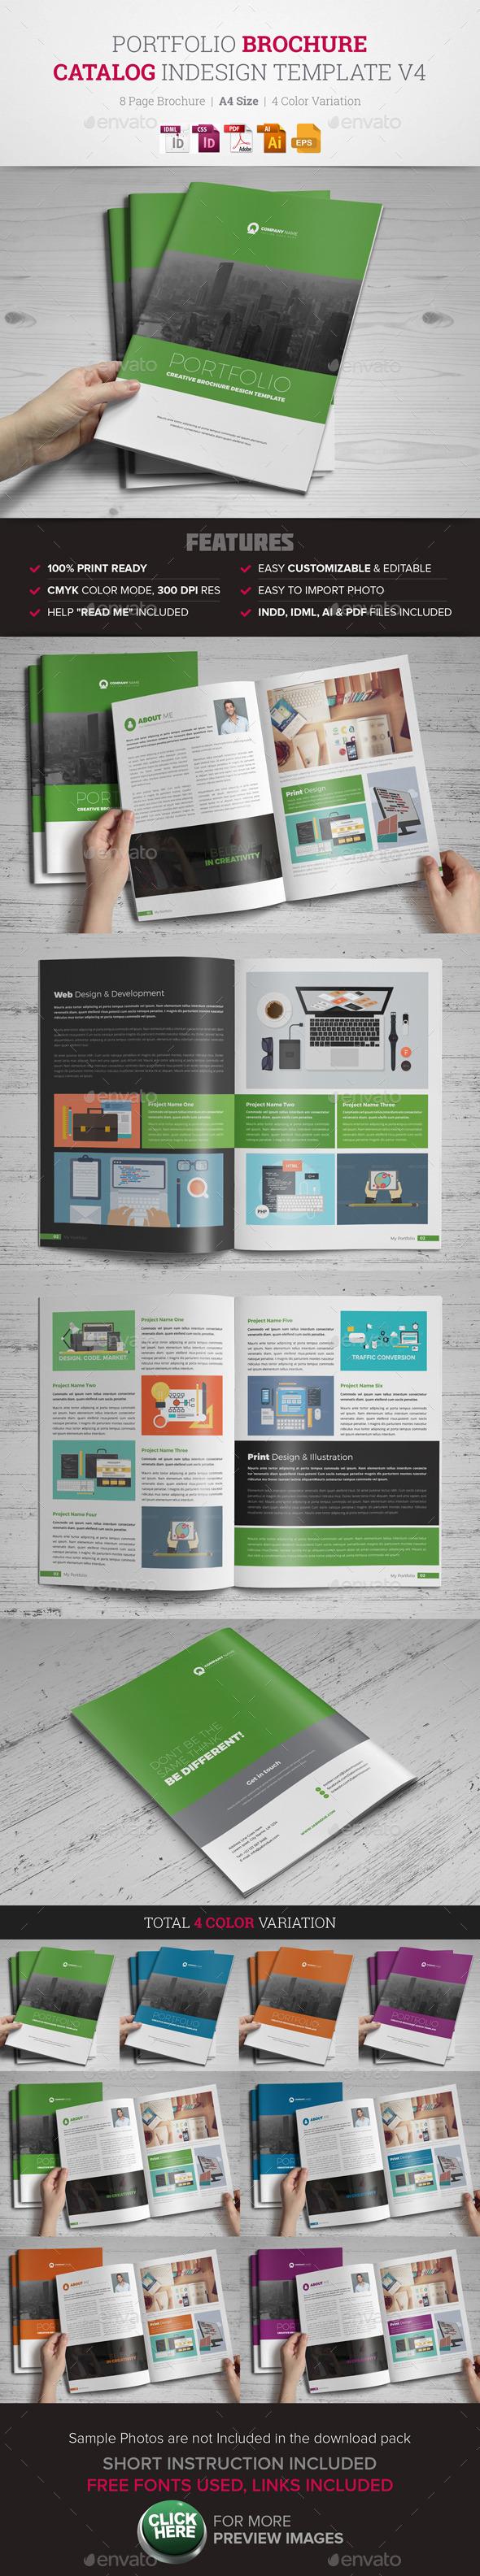 Portfolio Brochure InDesign Template v4  - Corporate Brochures